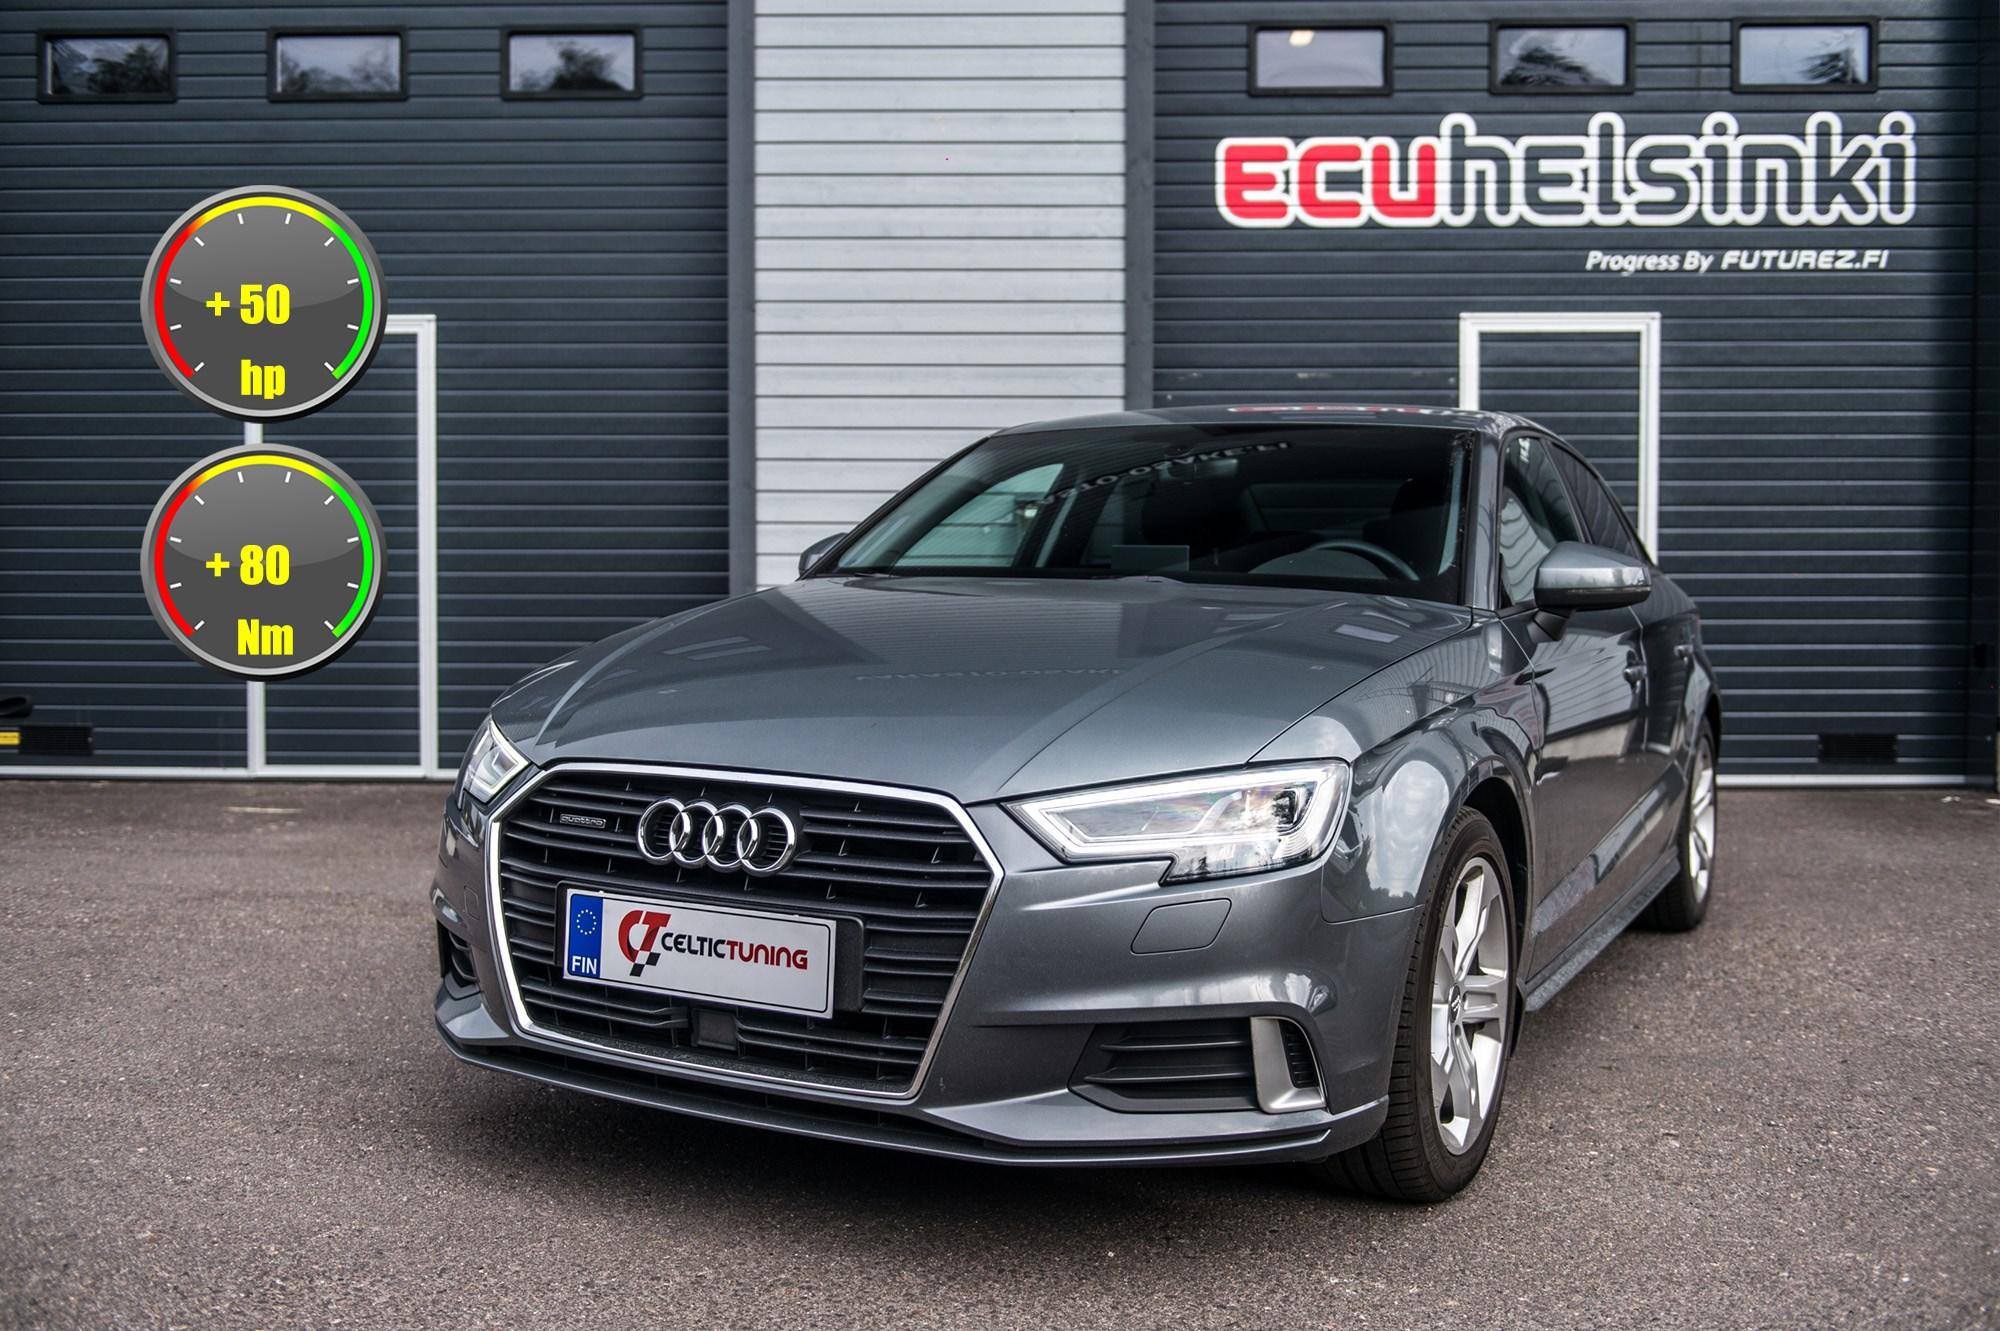 Audi A3 2.0 tfsi 2018 lastu celtic t